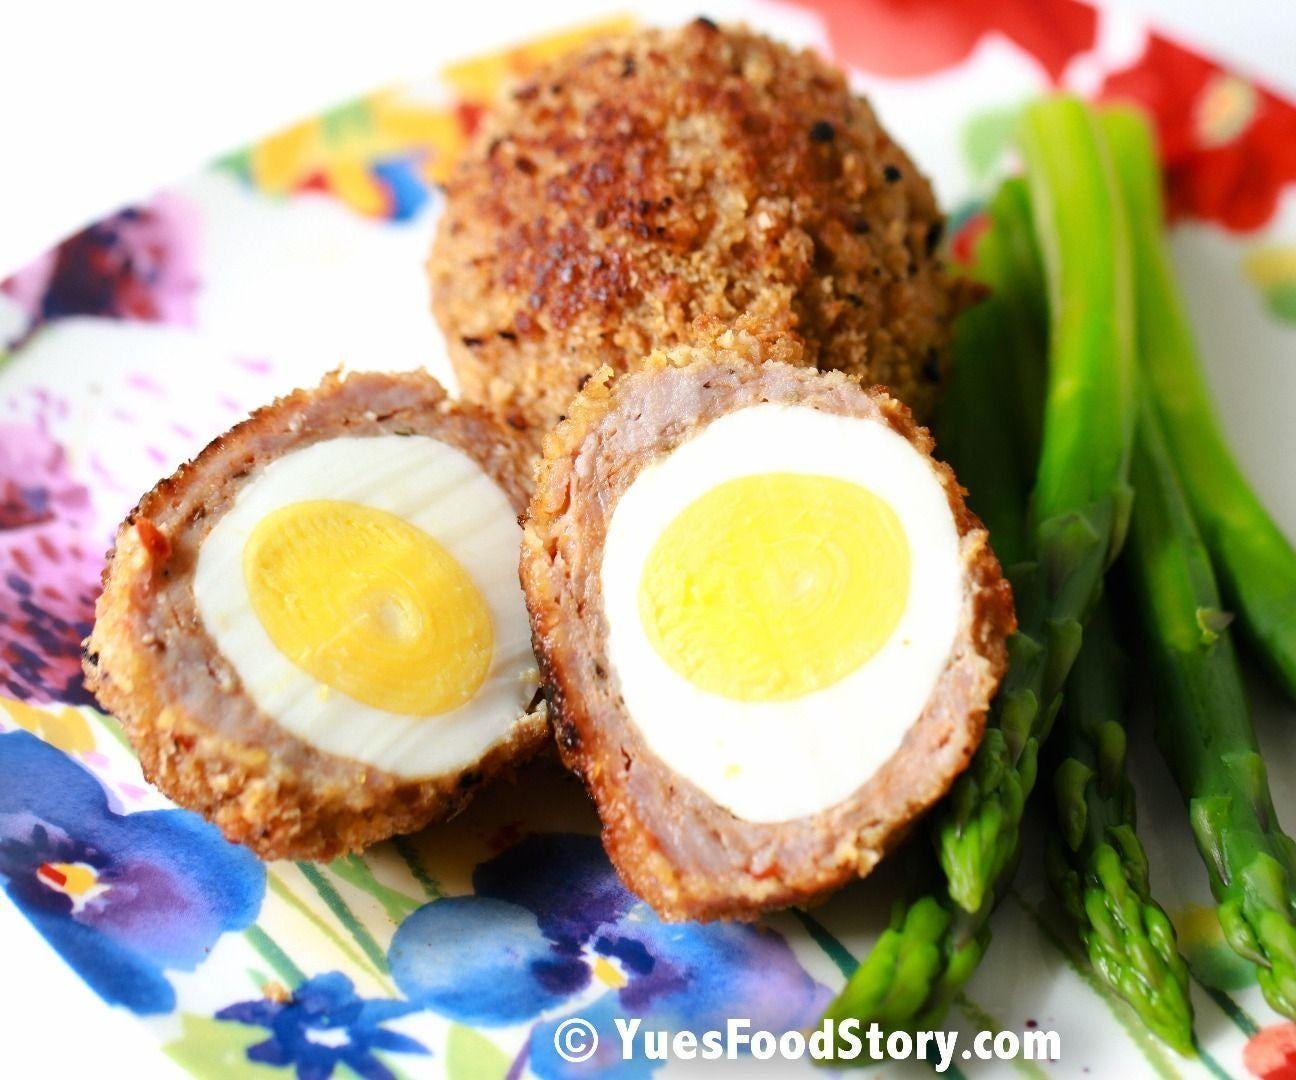 Baked/Fried/Pan Fried Scotch Egg #scotcheggs Baked/Fried/Pan Fried Scotch Egg #scotcheggs